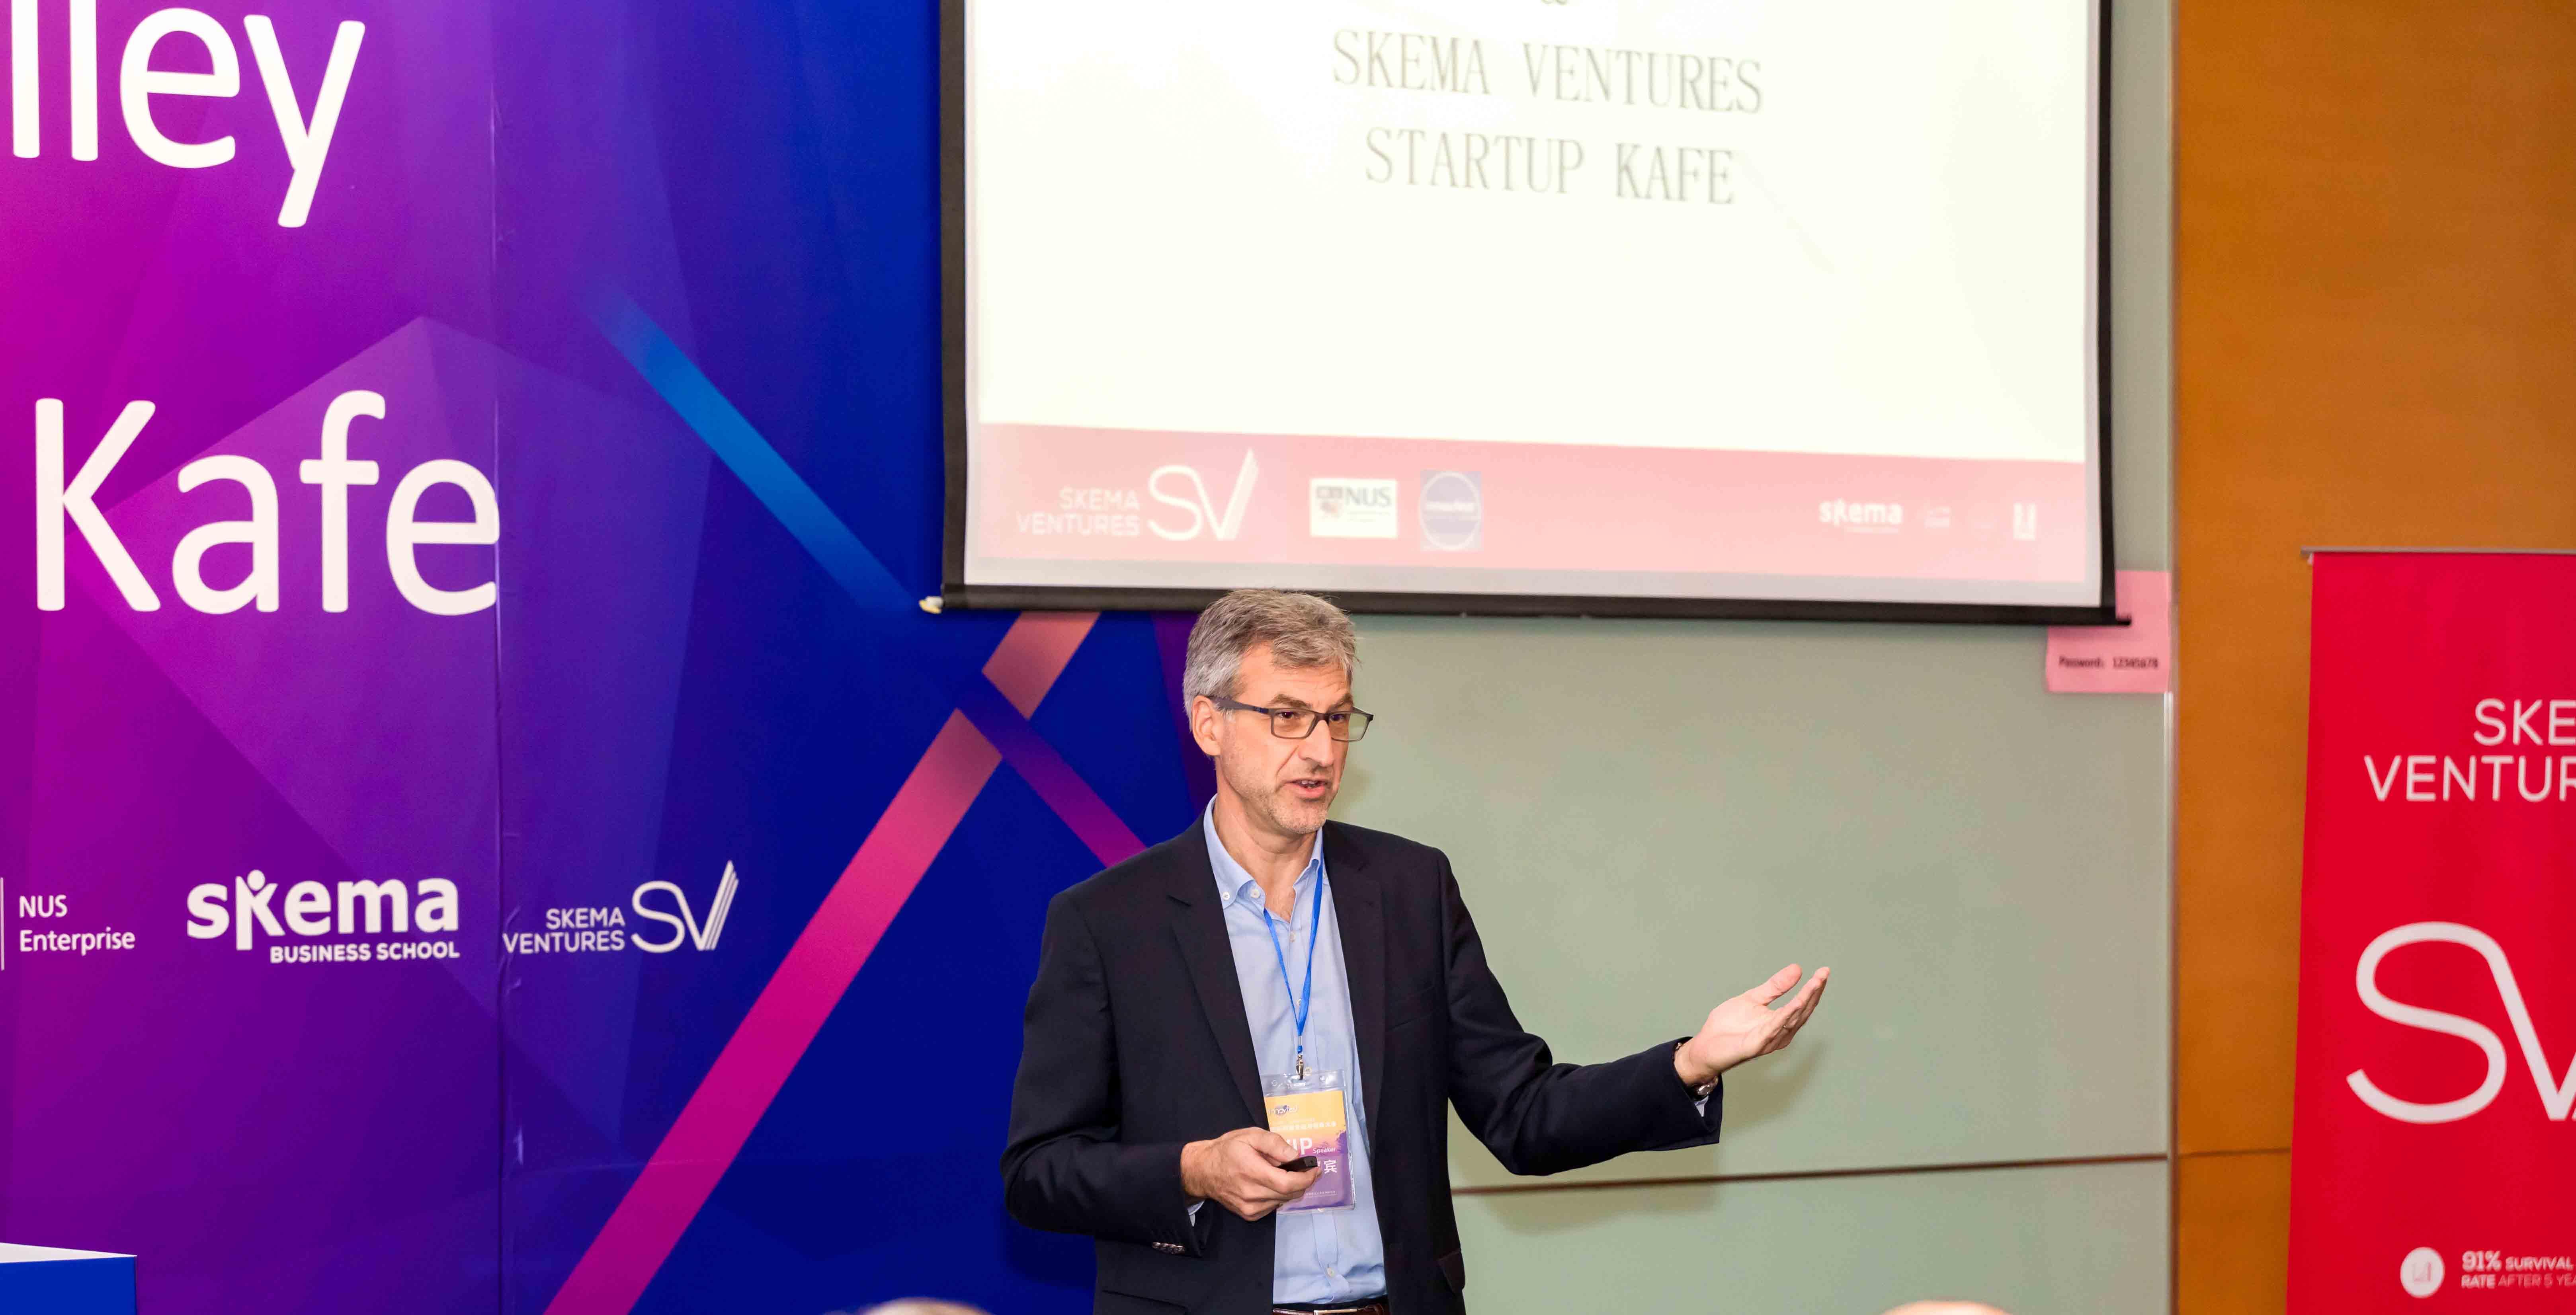 InnovAlley and Startup Kafe - Suzhou